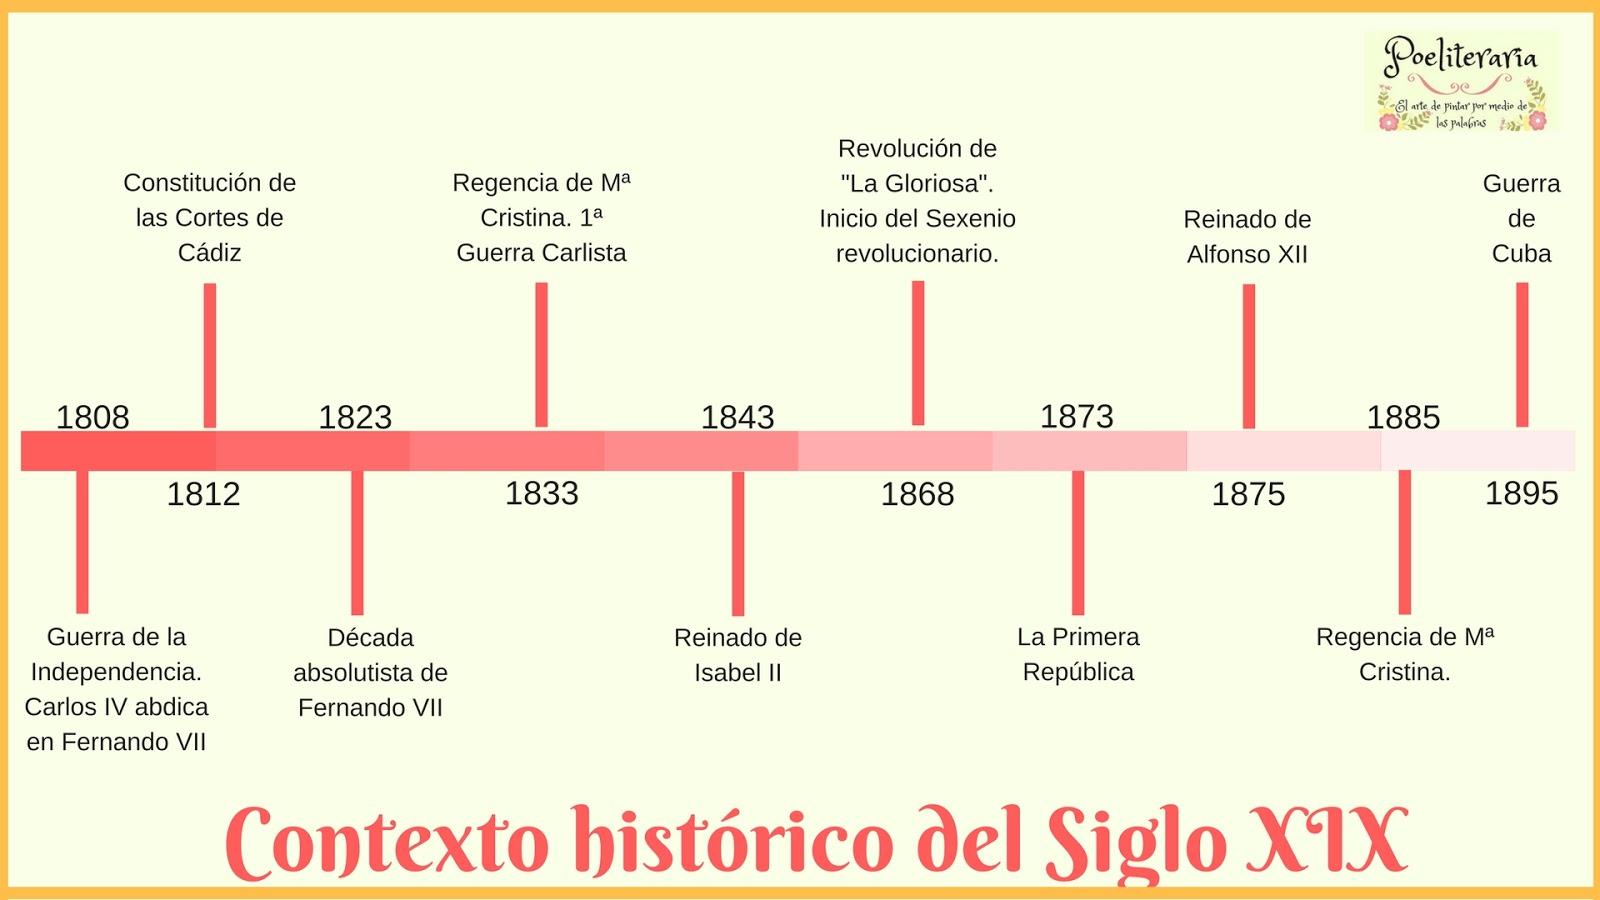 Contexto histórico del Siglo XIX